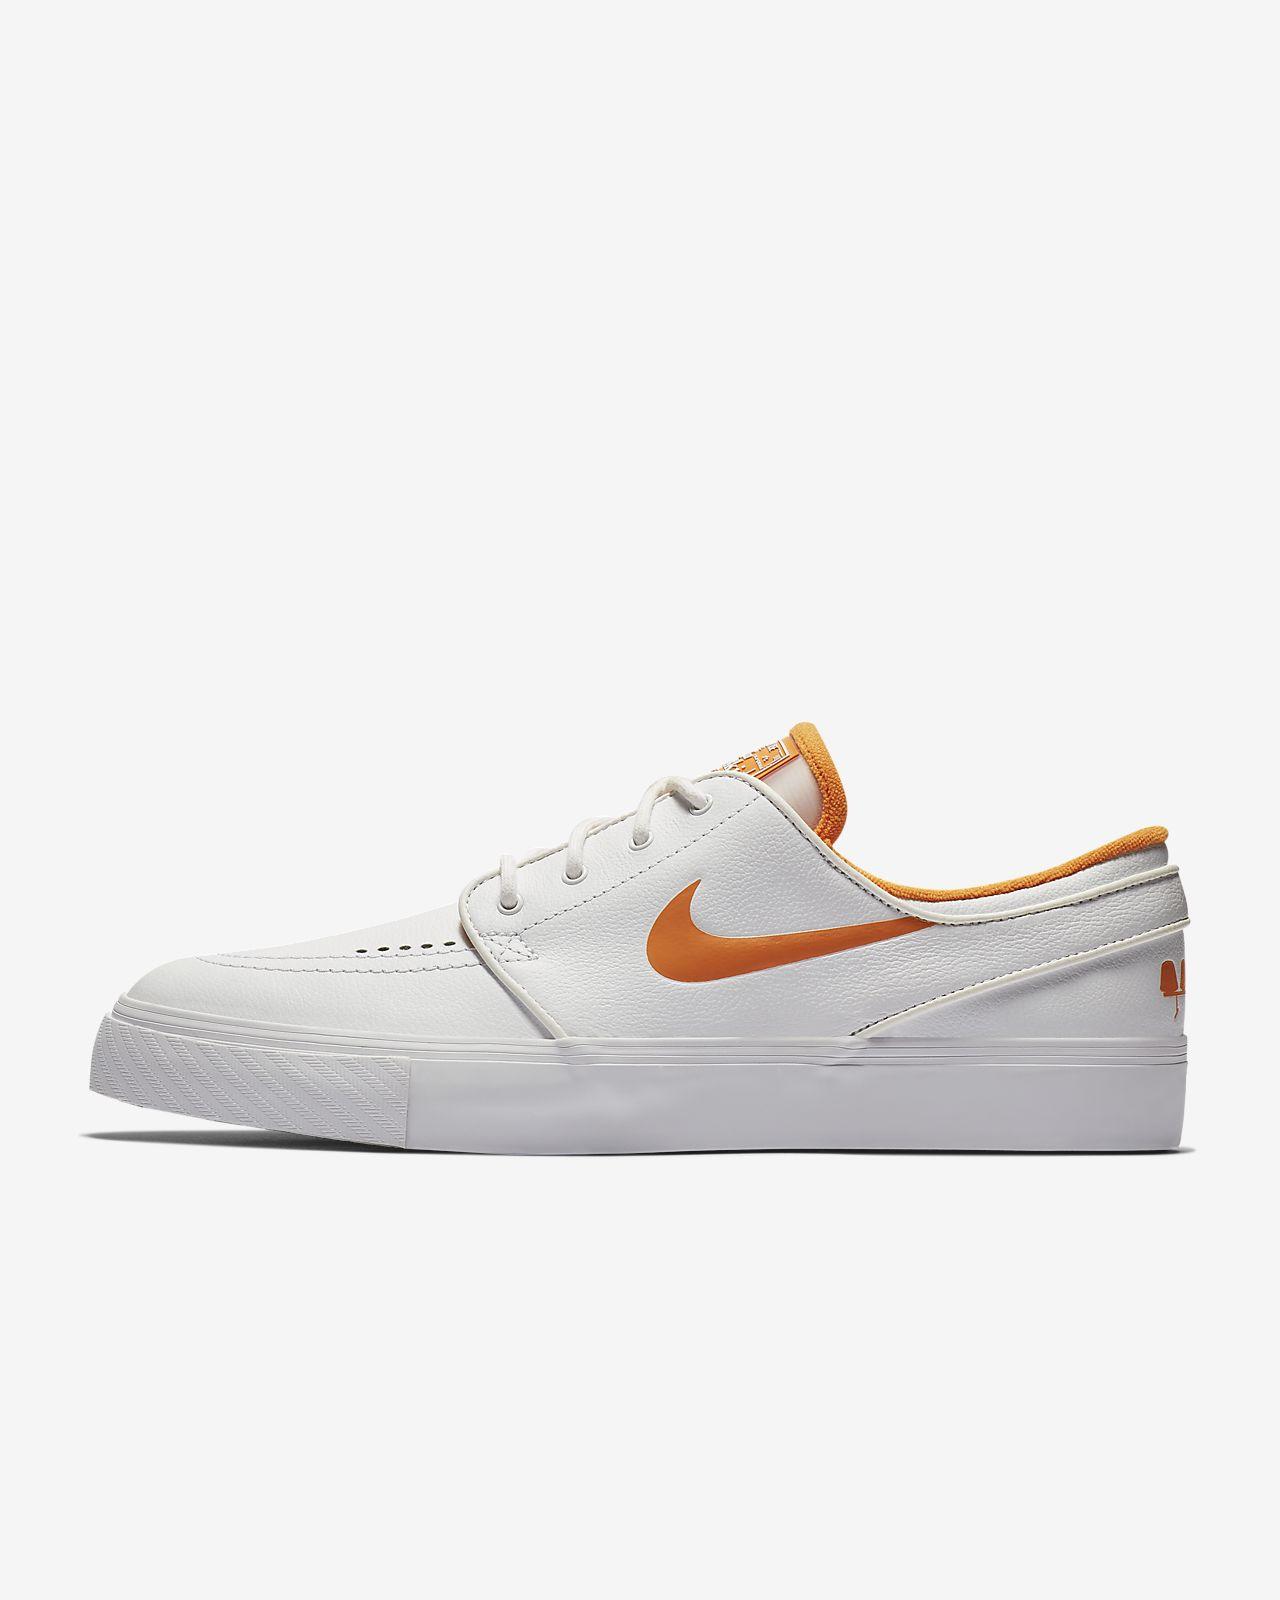 Nike SB Zoom Stefan Janoski QS 男子滑板鞋